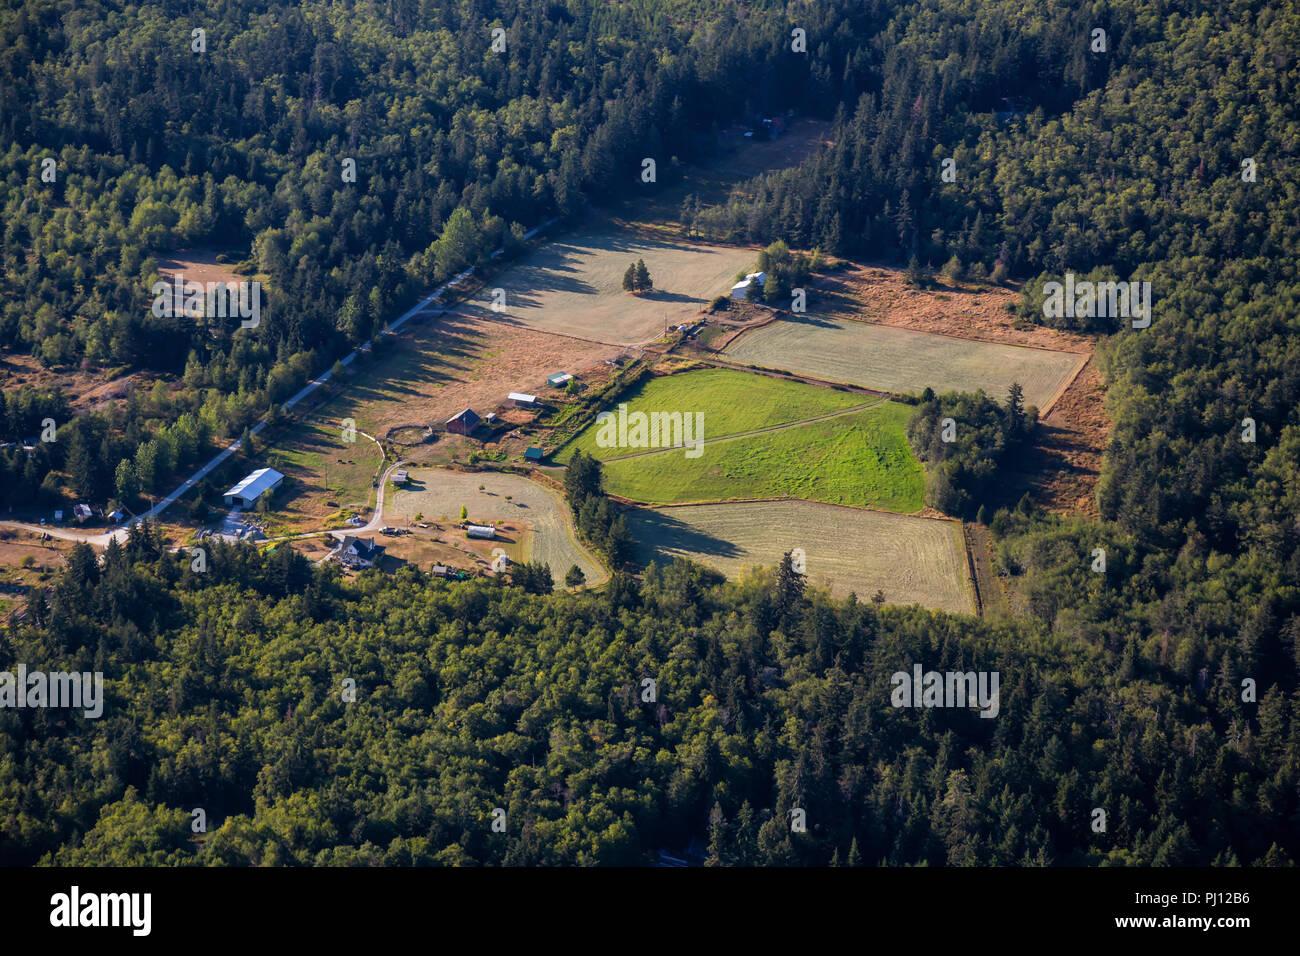 Aerial view of Farm lands on Texada Island, Powell River, Sunshine Coast, BC, Canada. - Stock Image